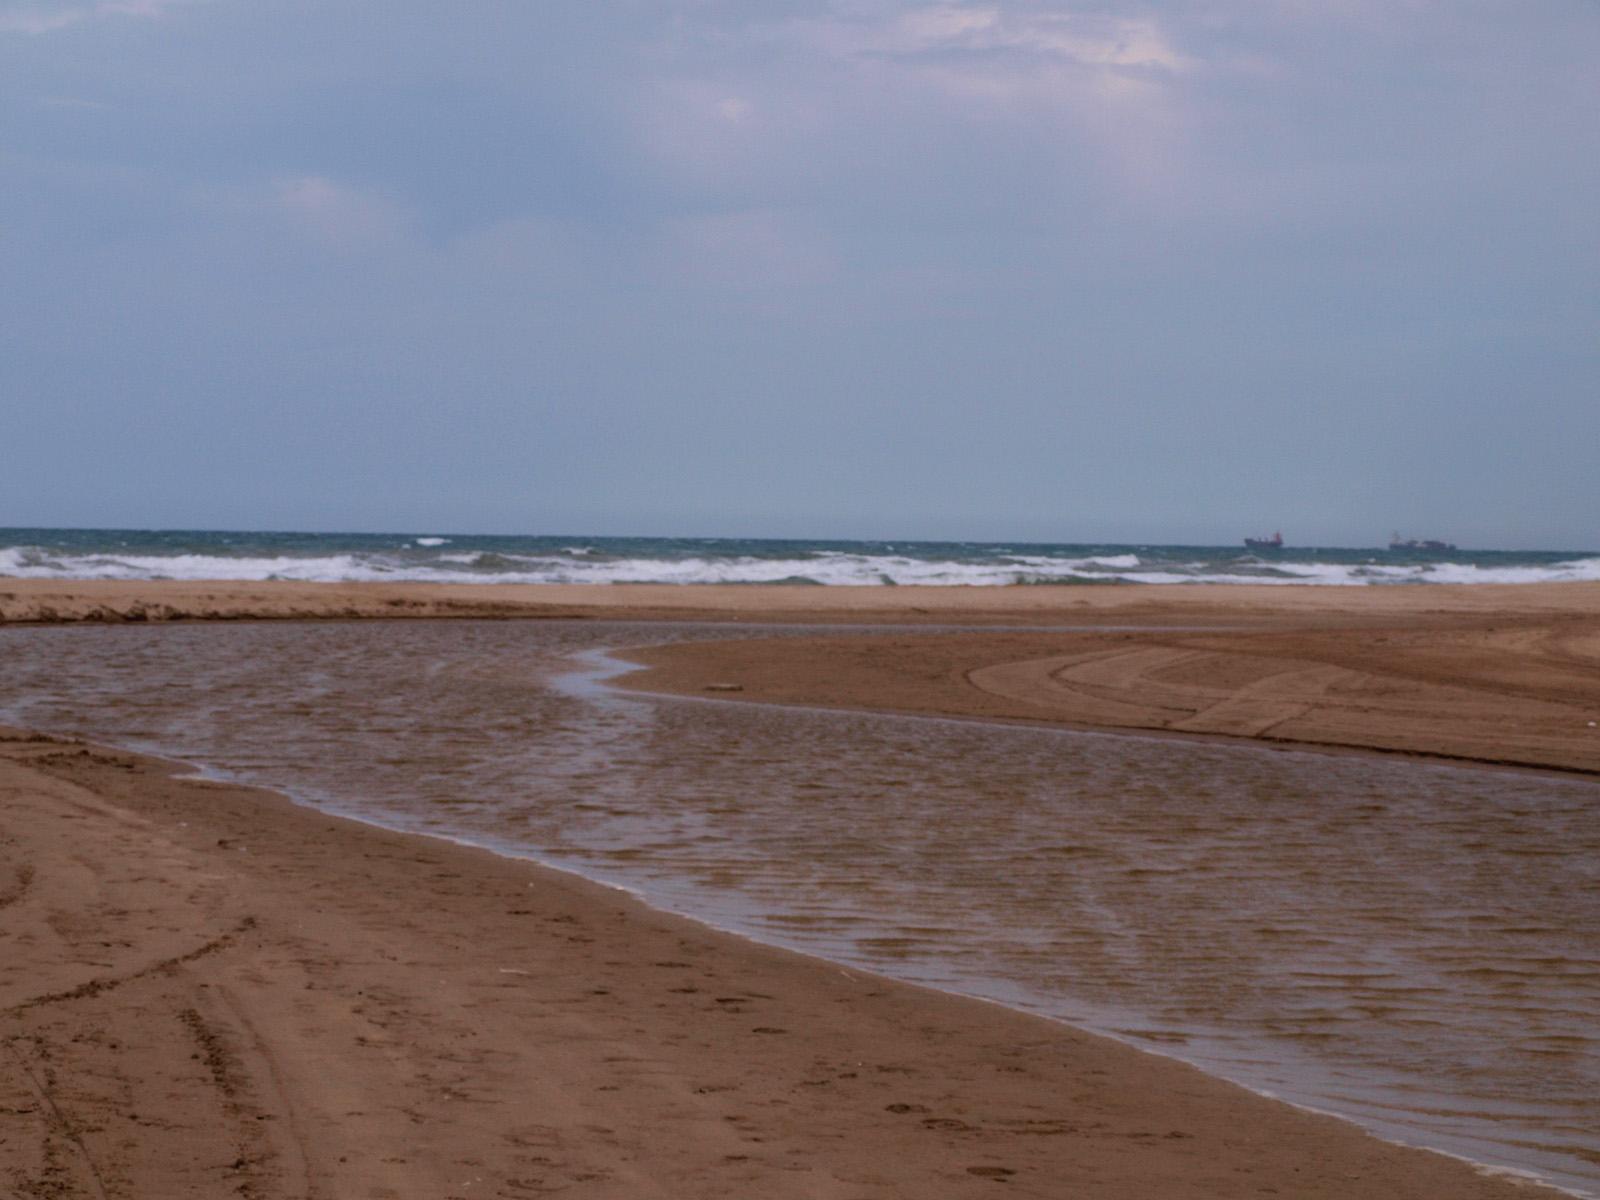 Playa Alcazaba